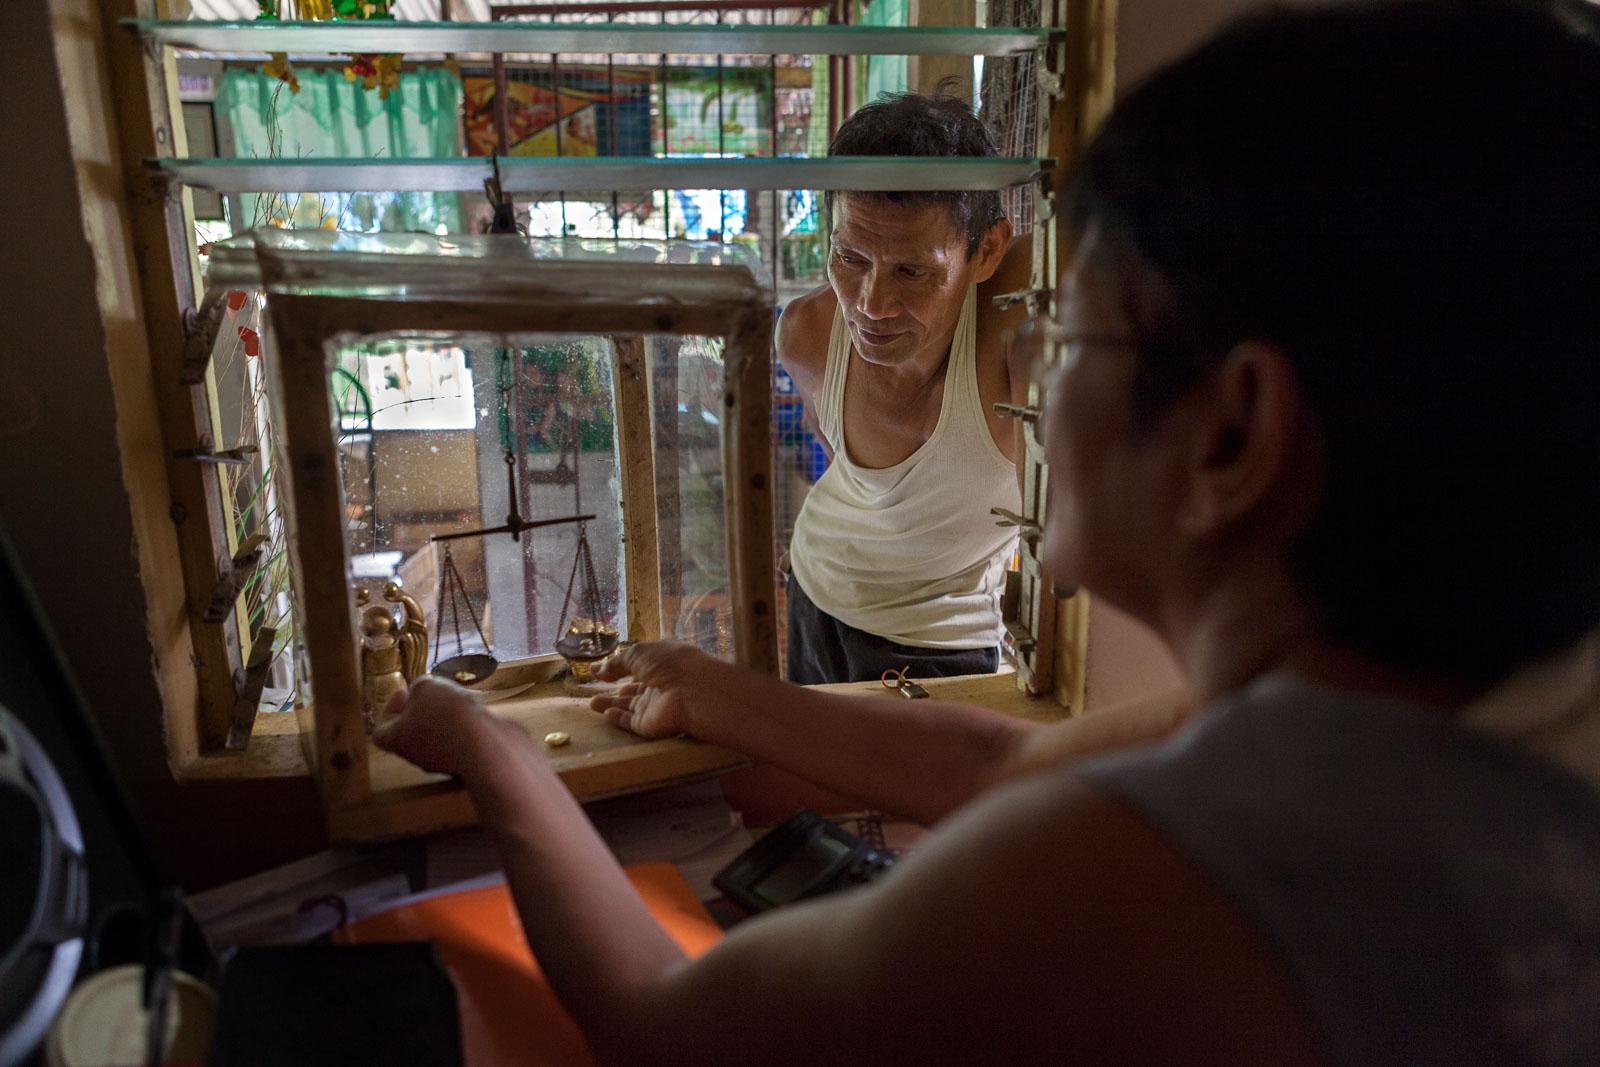 Elsie Villaflores, Kioskbesitzerin und Goldverkäuferin